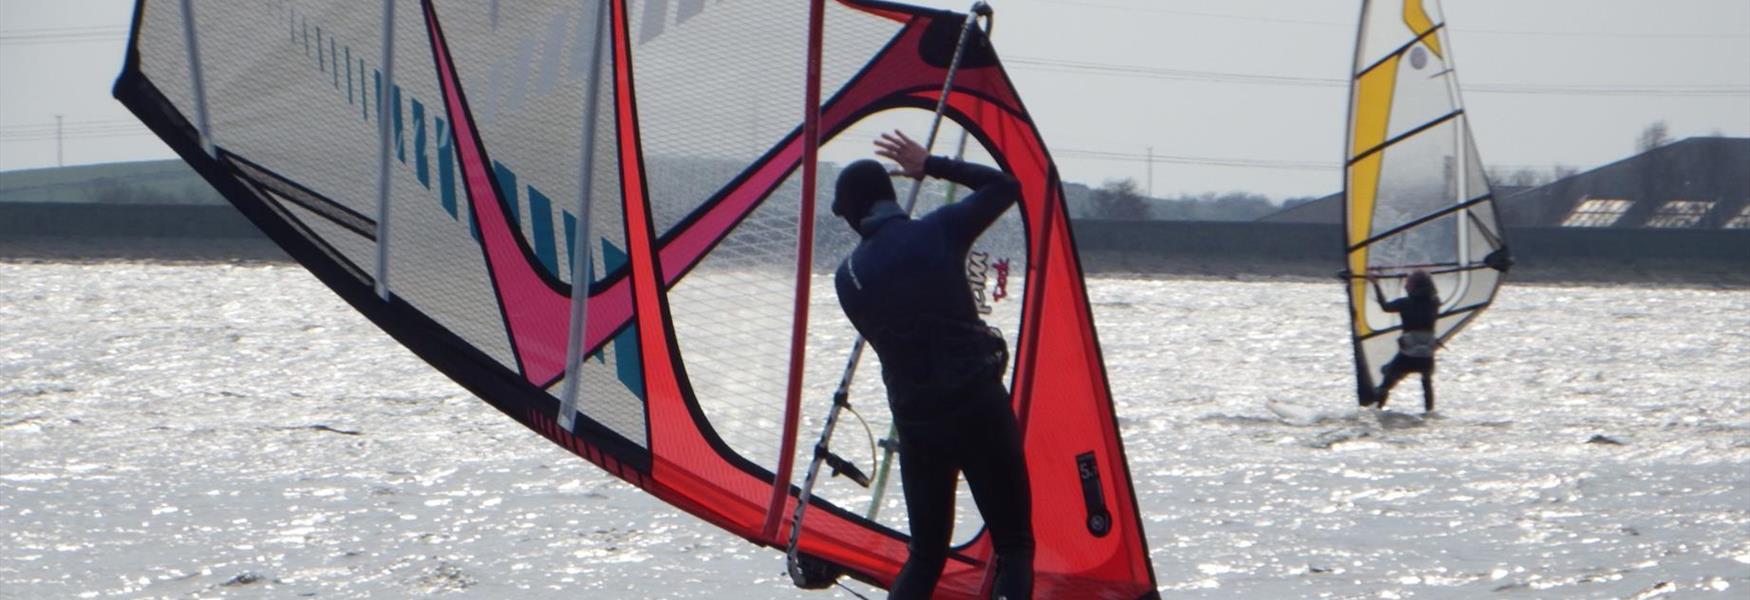 A lone windsurfer on Hollingworth Lake.